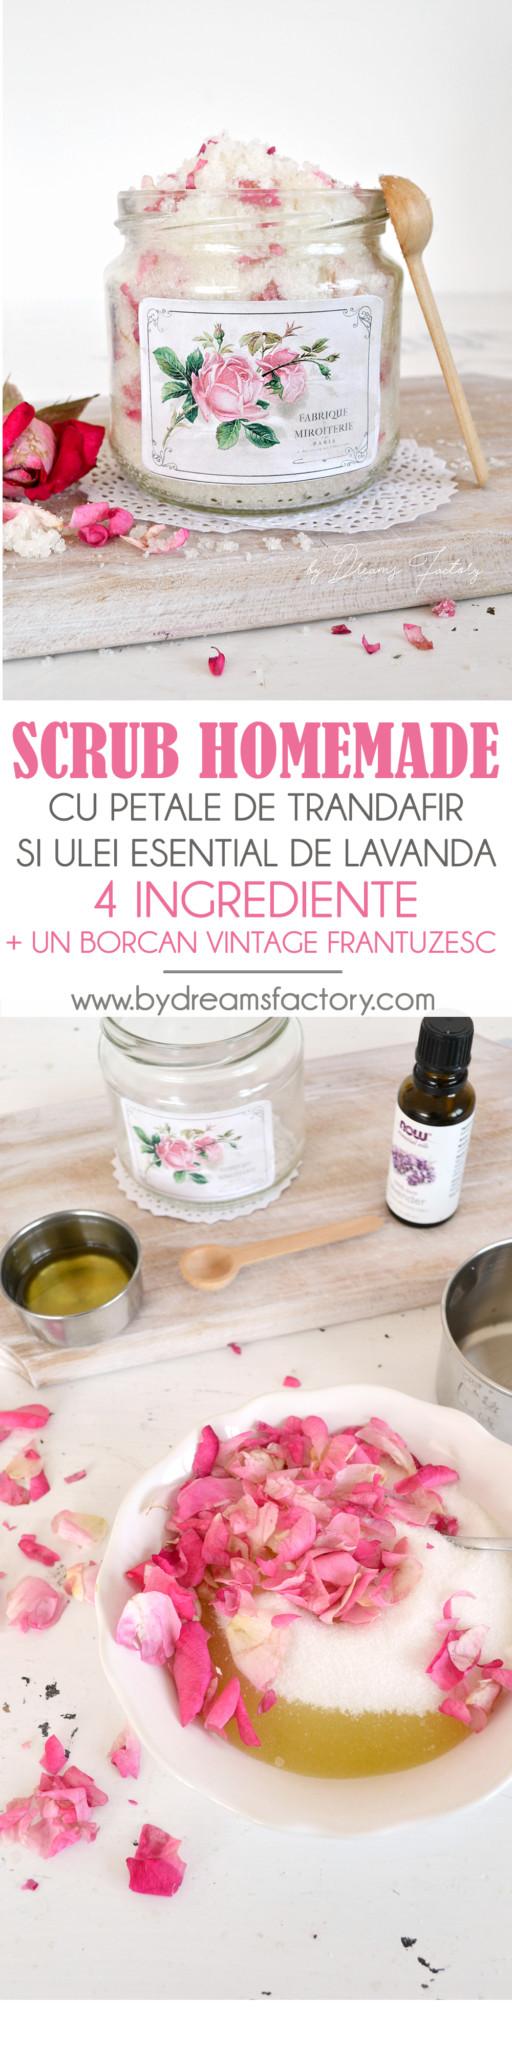 scrub-cu-zahar-petale-de-trandafir-si-ulei-esential-de-lavanda-dreams-factory